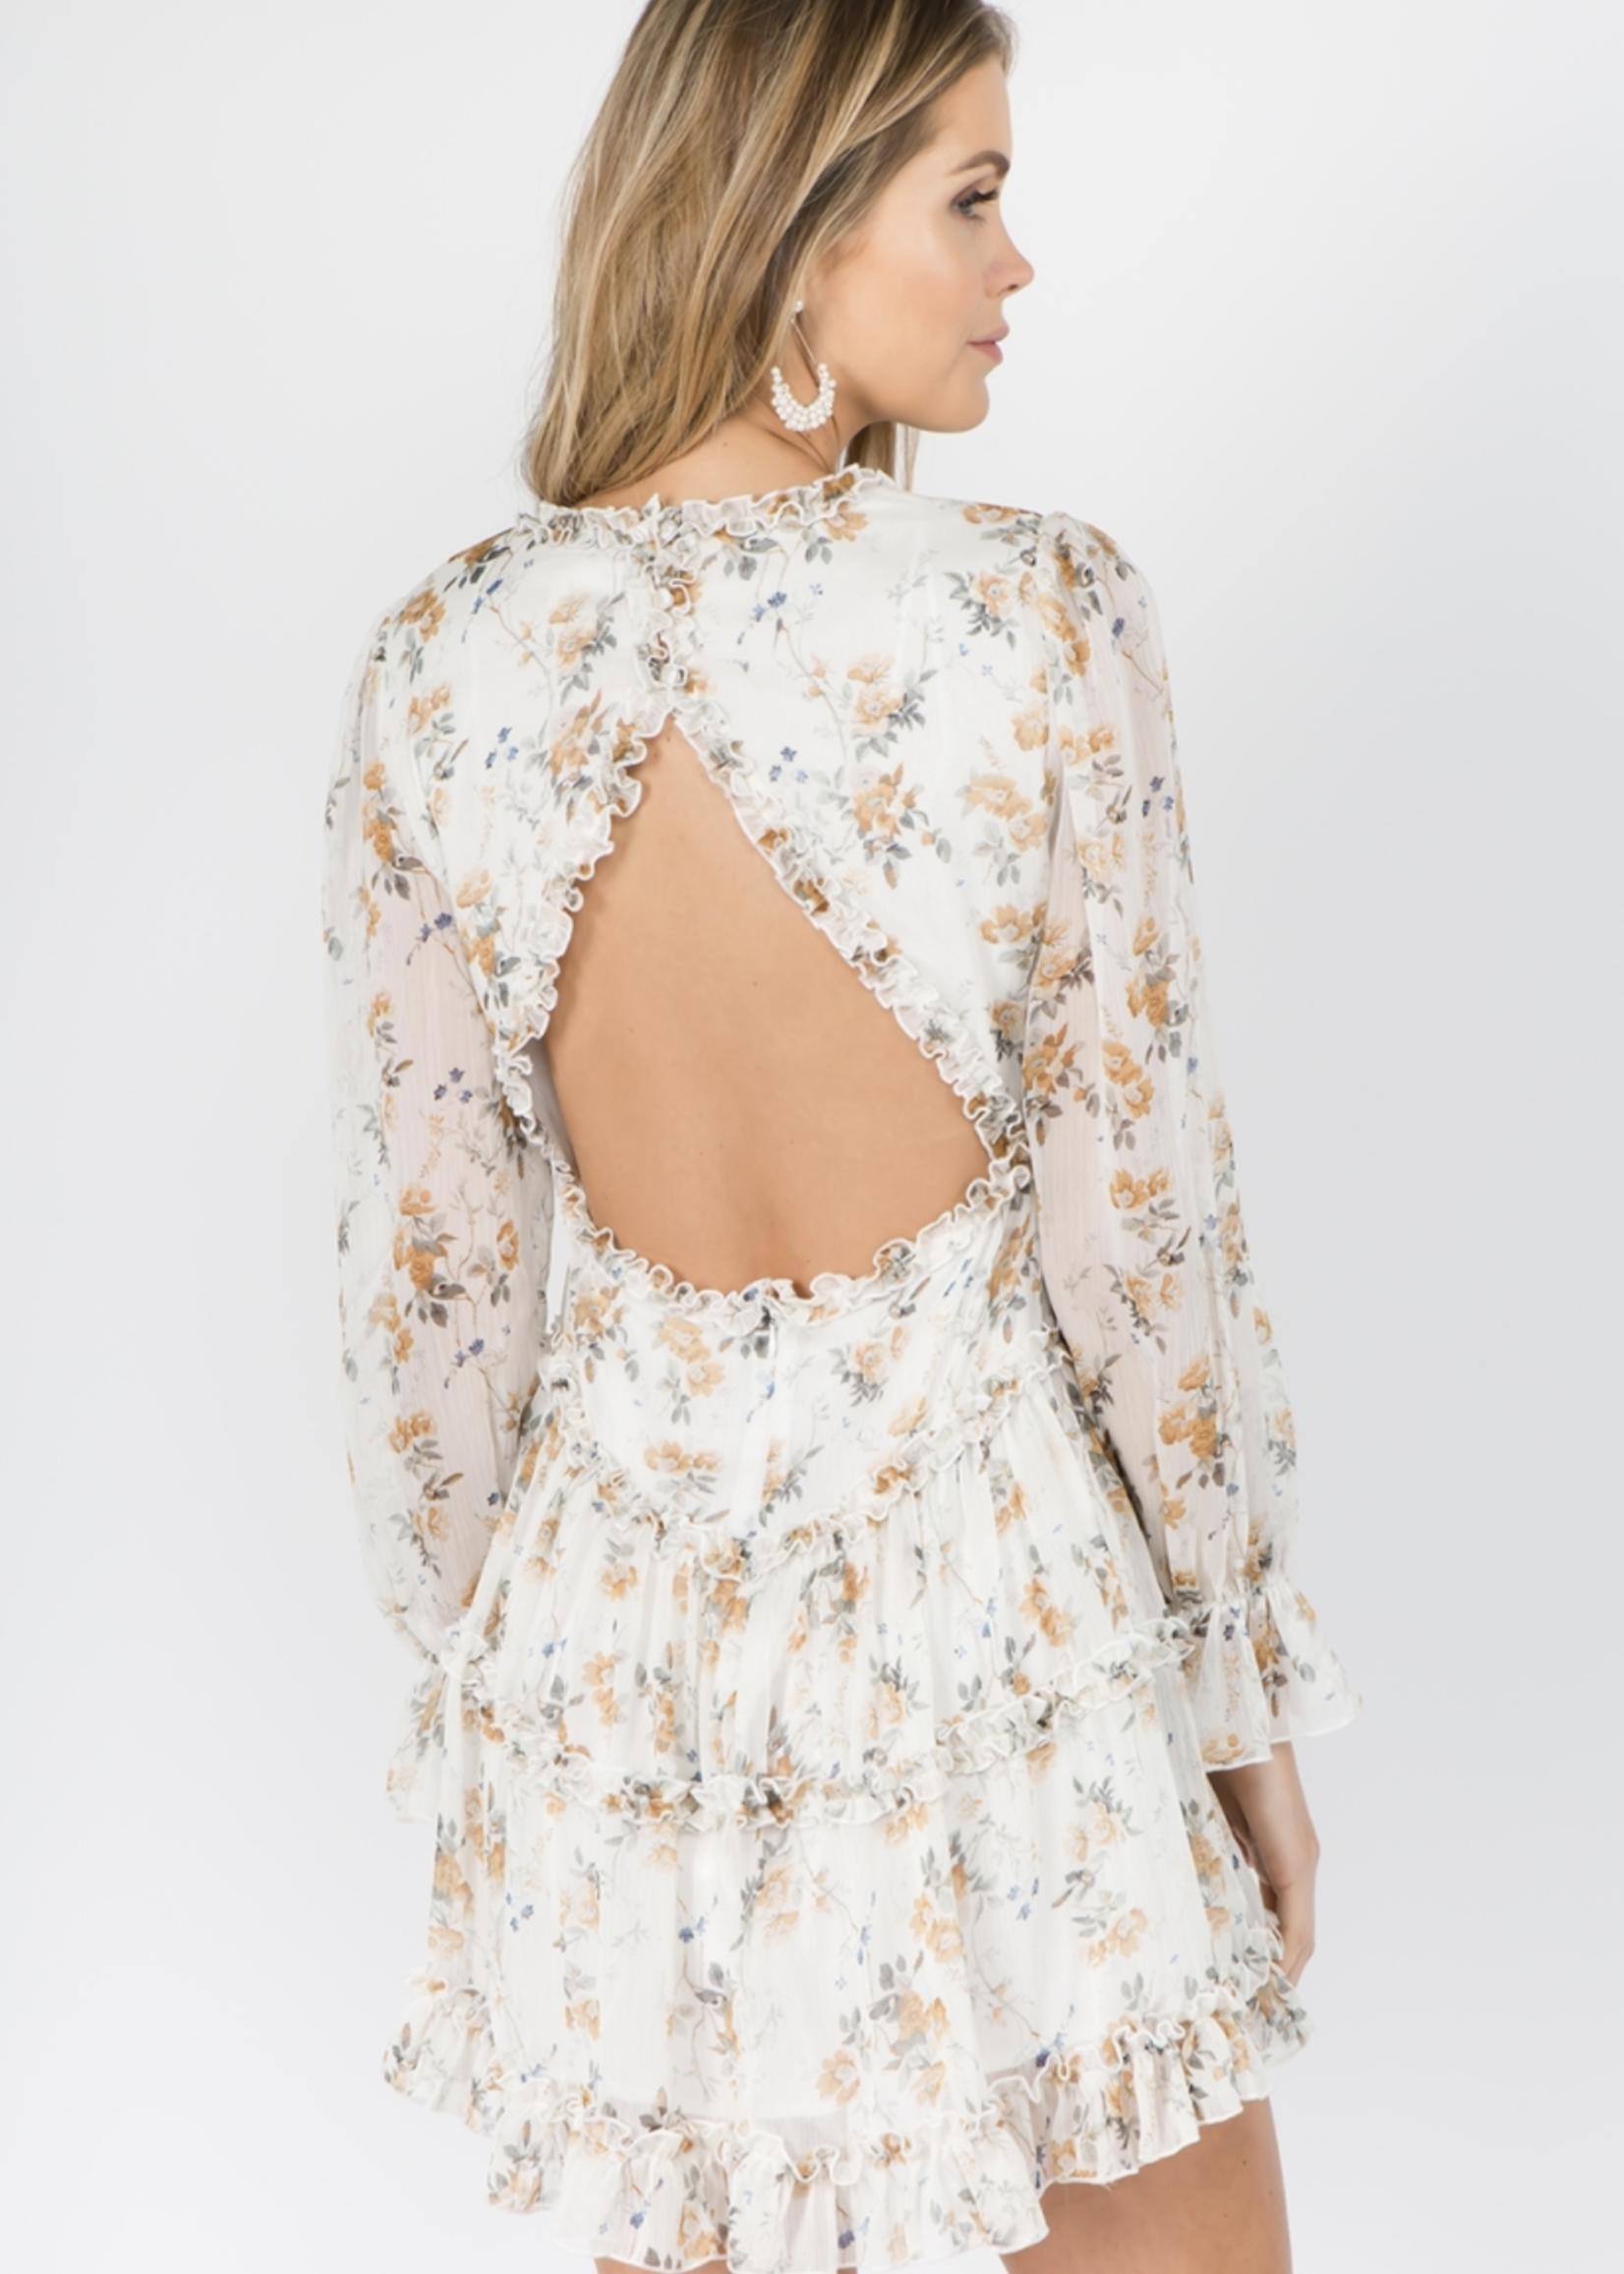 Fanco Floral Open Back Dress